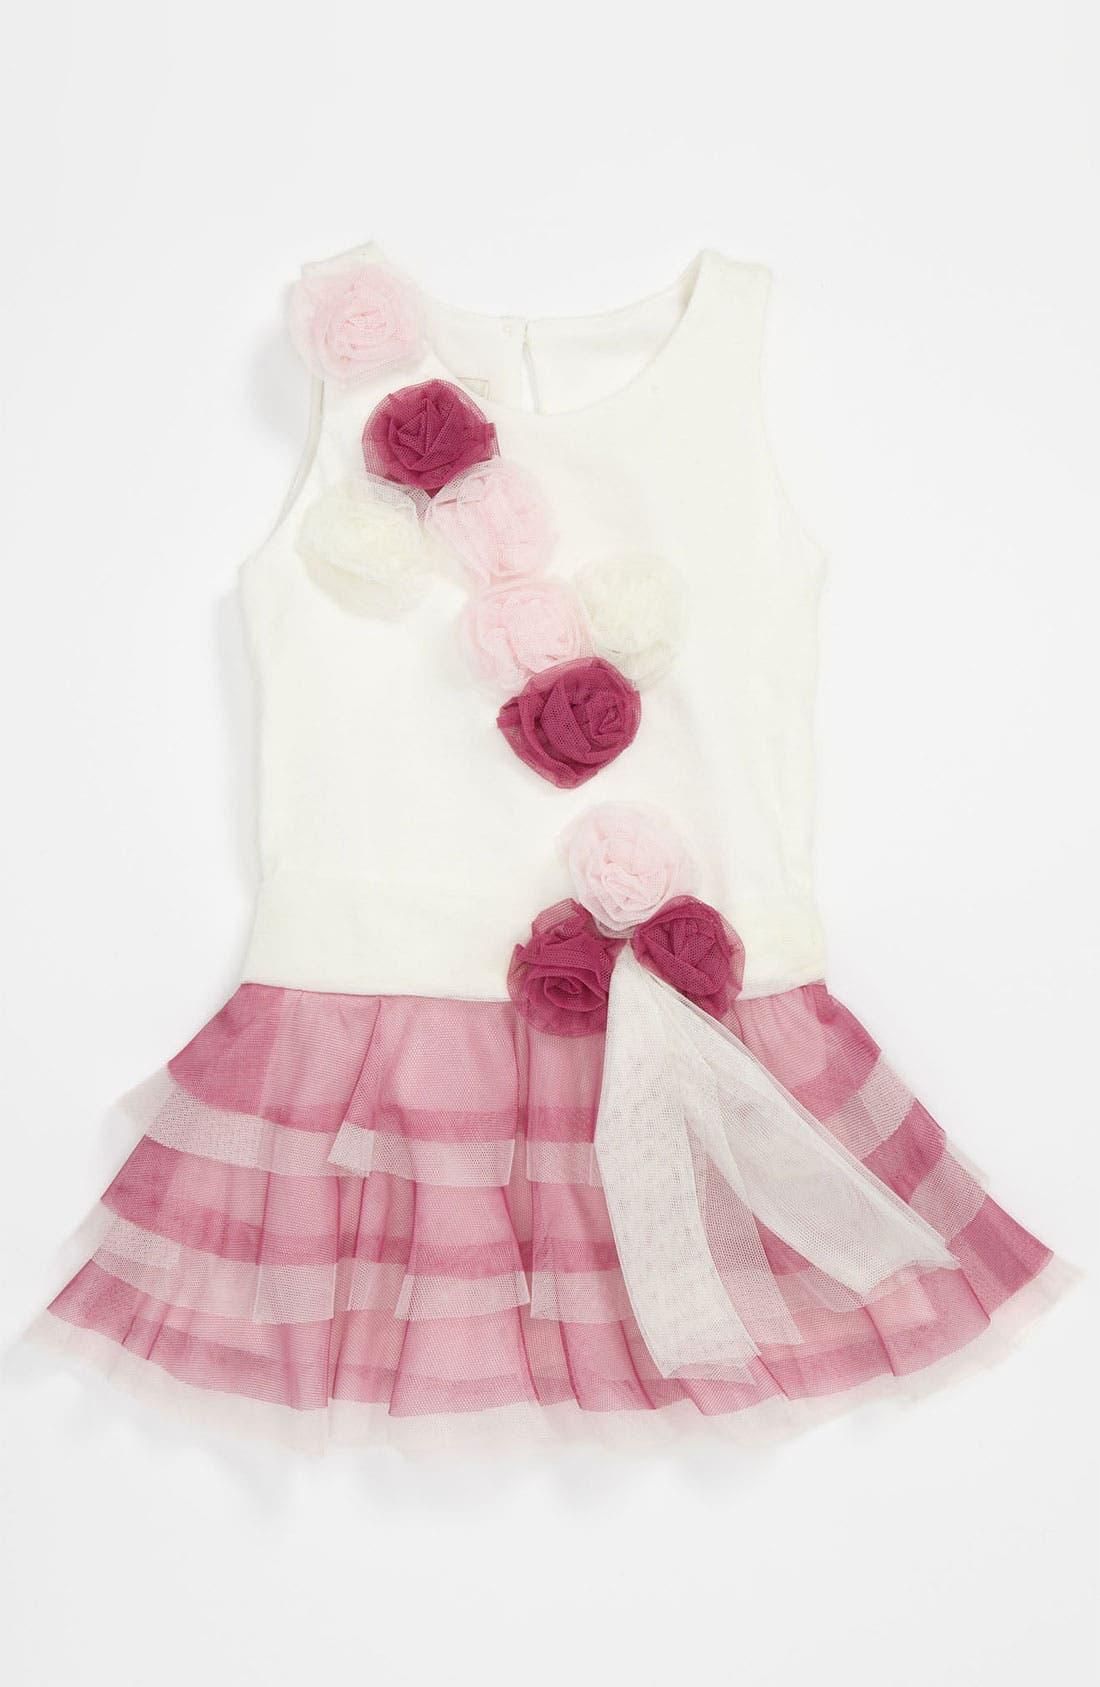 Alternate Image 1 Selected - Isobella & Chloe Cotton & Tulle Dress (Baby)